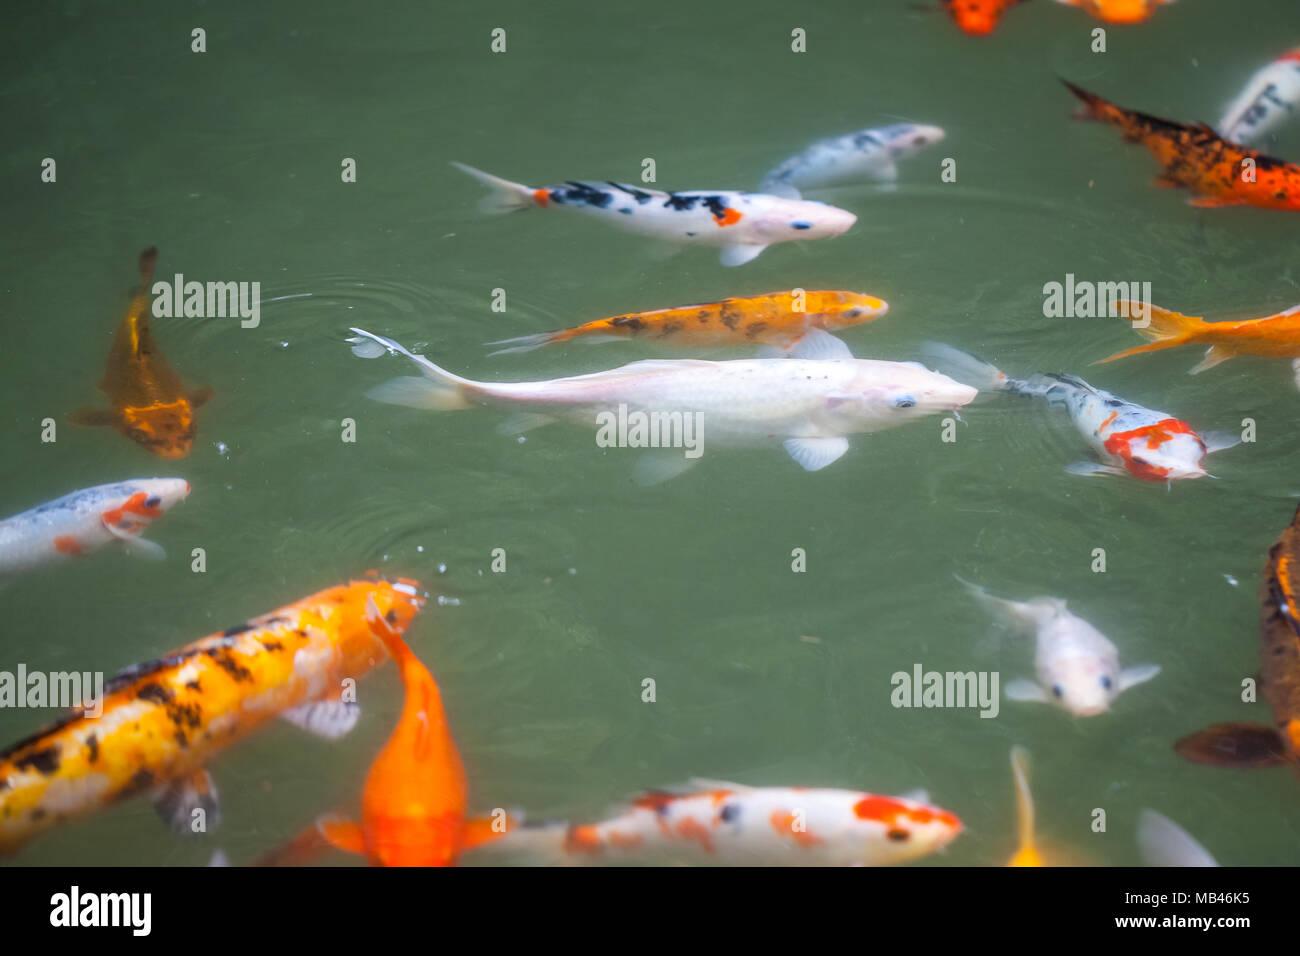 Japan fish call Carp or Koi fish colorful, Many fishes many color ...